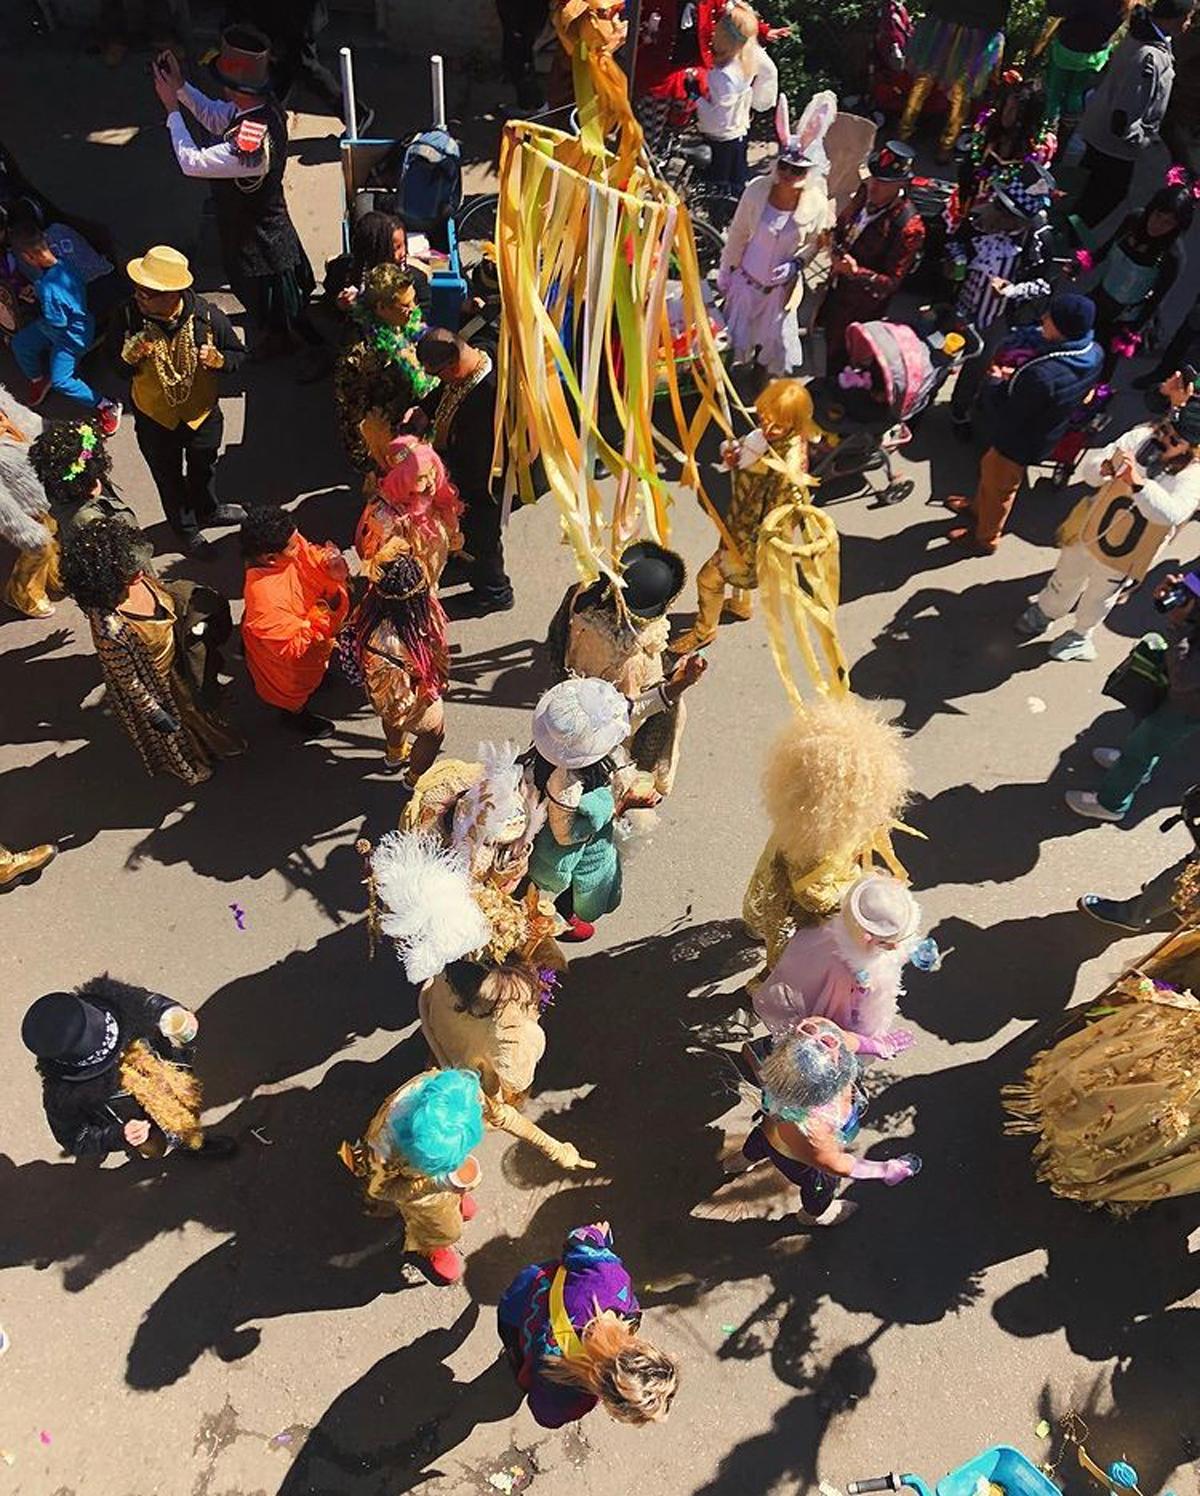 Photo by Molly Olwig of Mardi Gras festivities